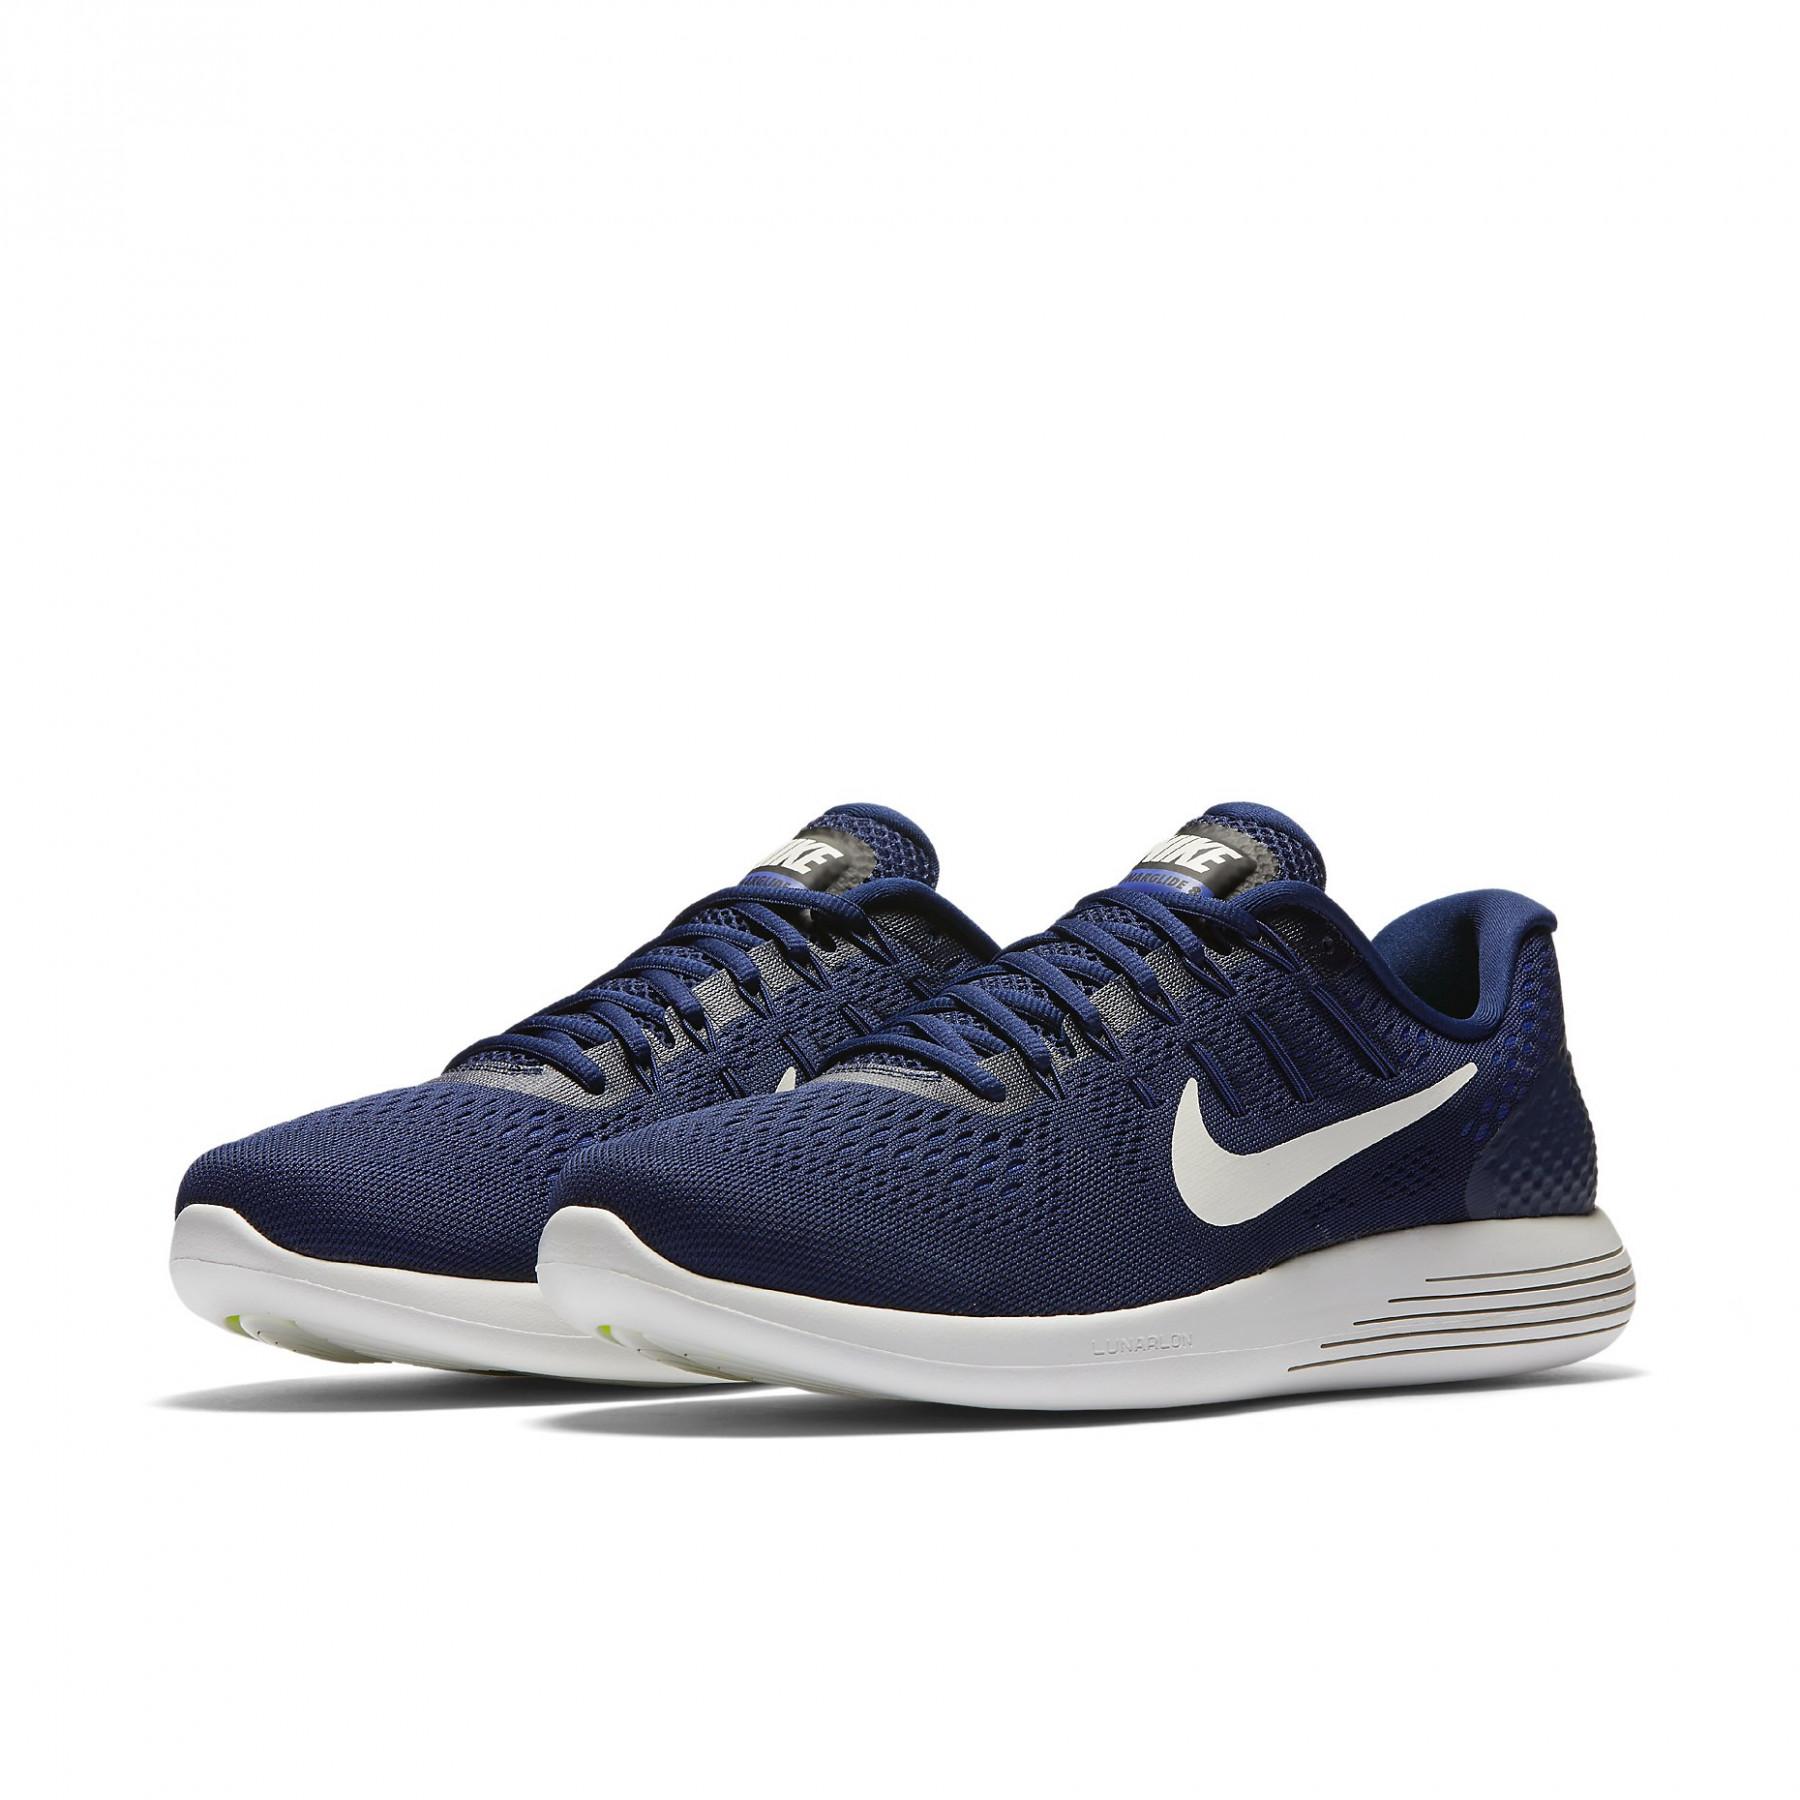 Chaussures de running pour homme